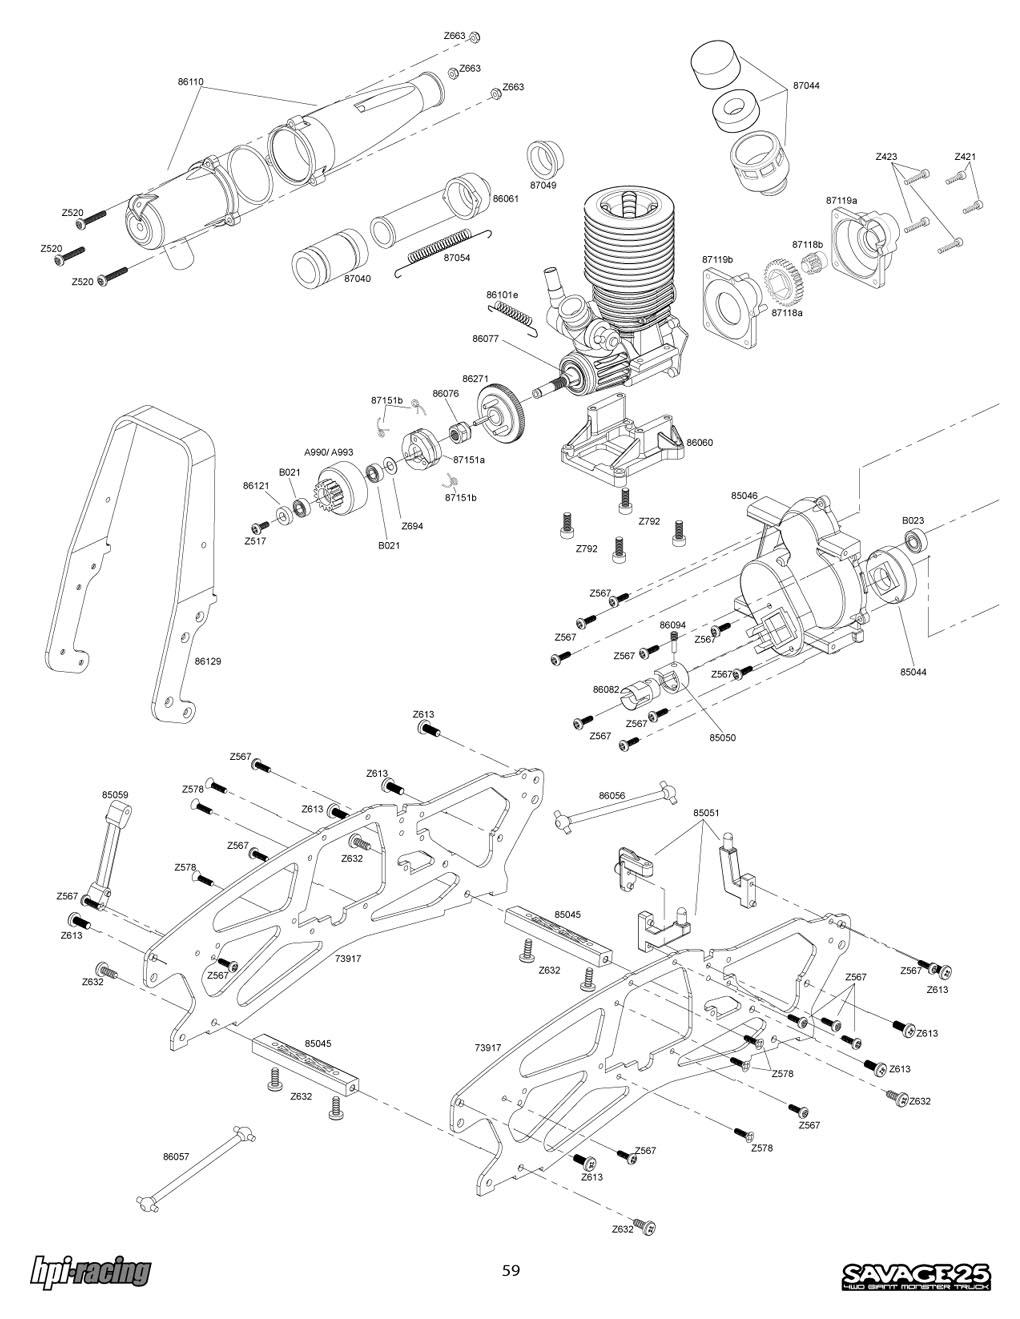 hight resolution of hpi 4 6 max parts diagram blog wiring diagram hpi savage 4 6 parts diagram